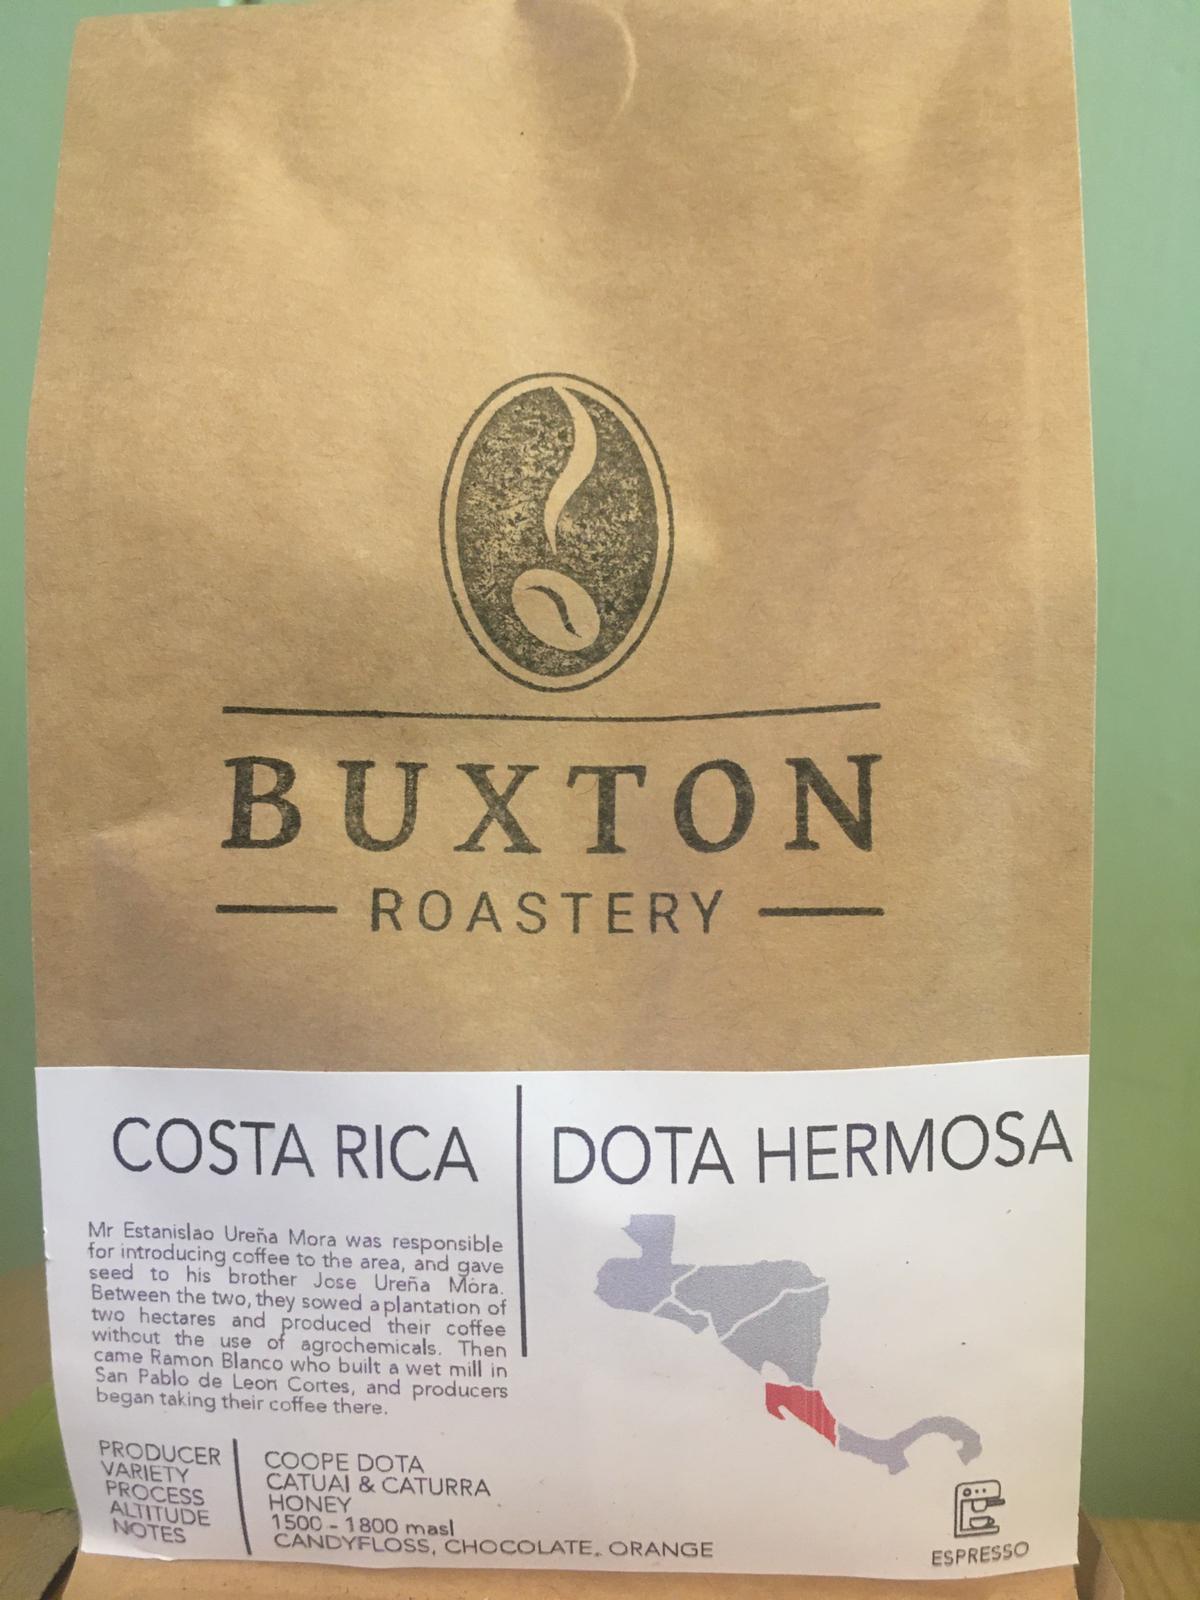 Buxton Roastery Coffee - Costa Rica Dota Hermosa 225g